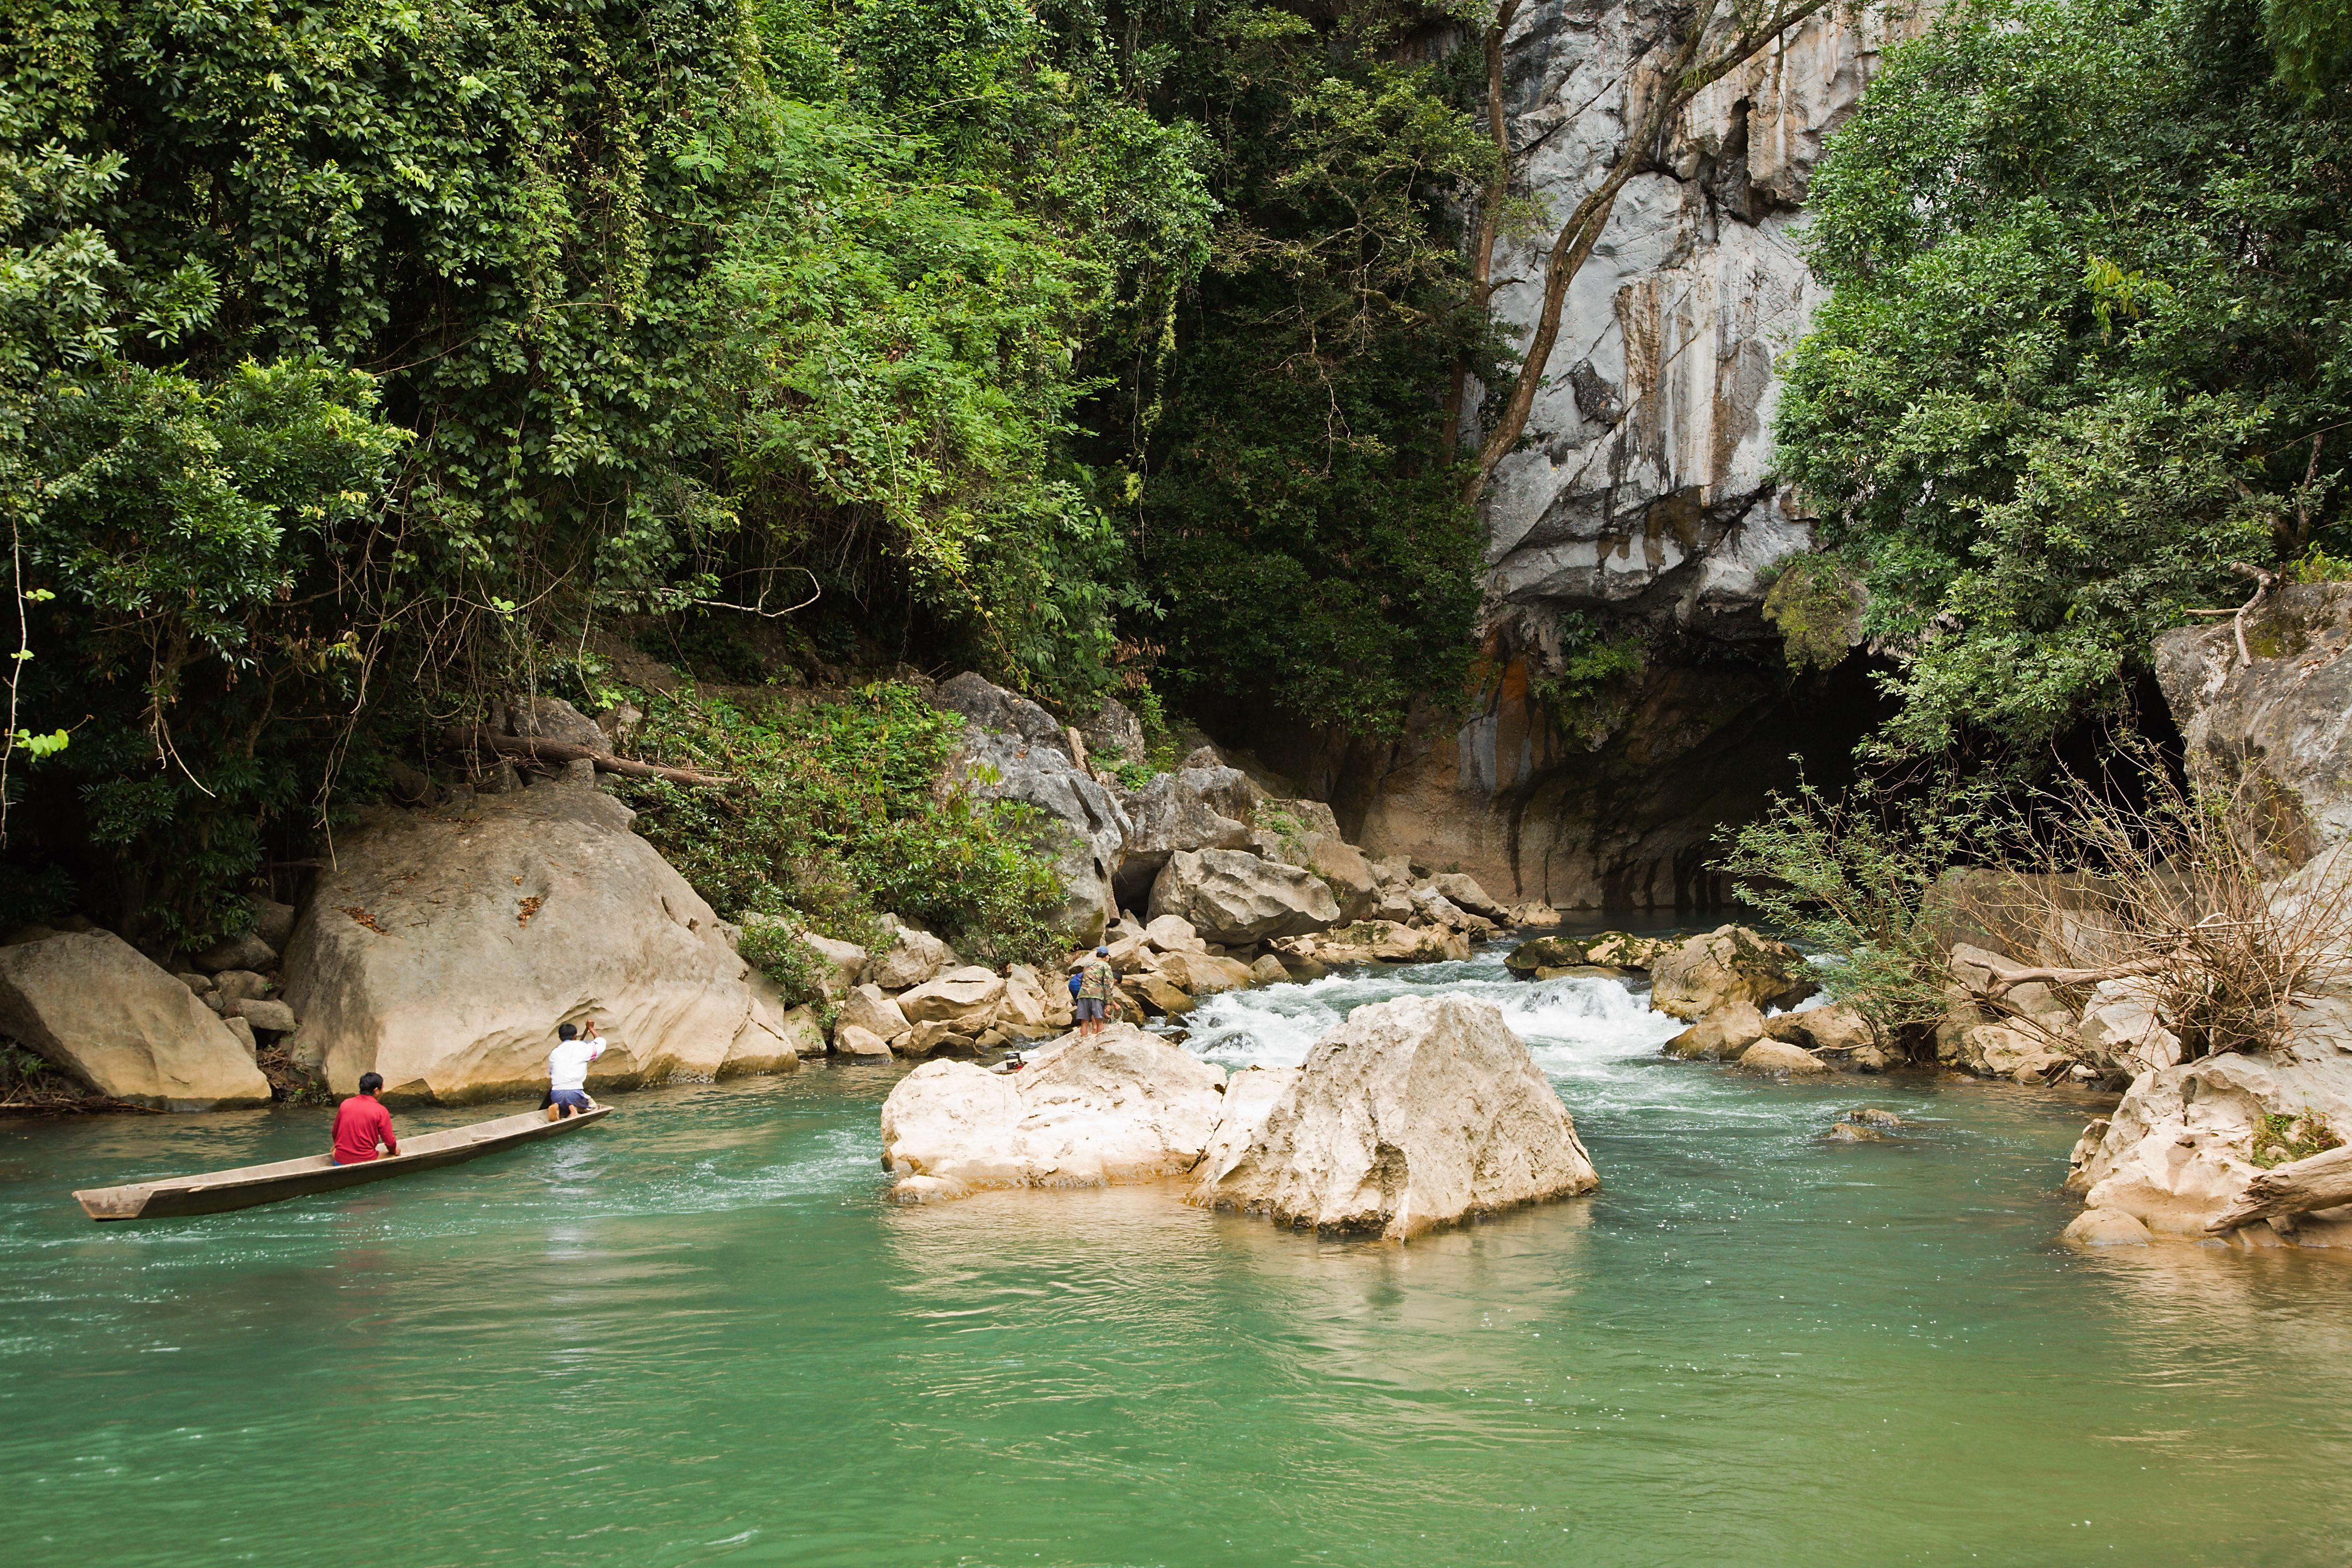 Boats before entrance to Tham Kong Lo cave near Ban Khoun Kham.